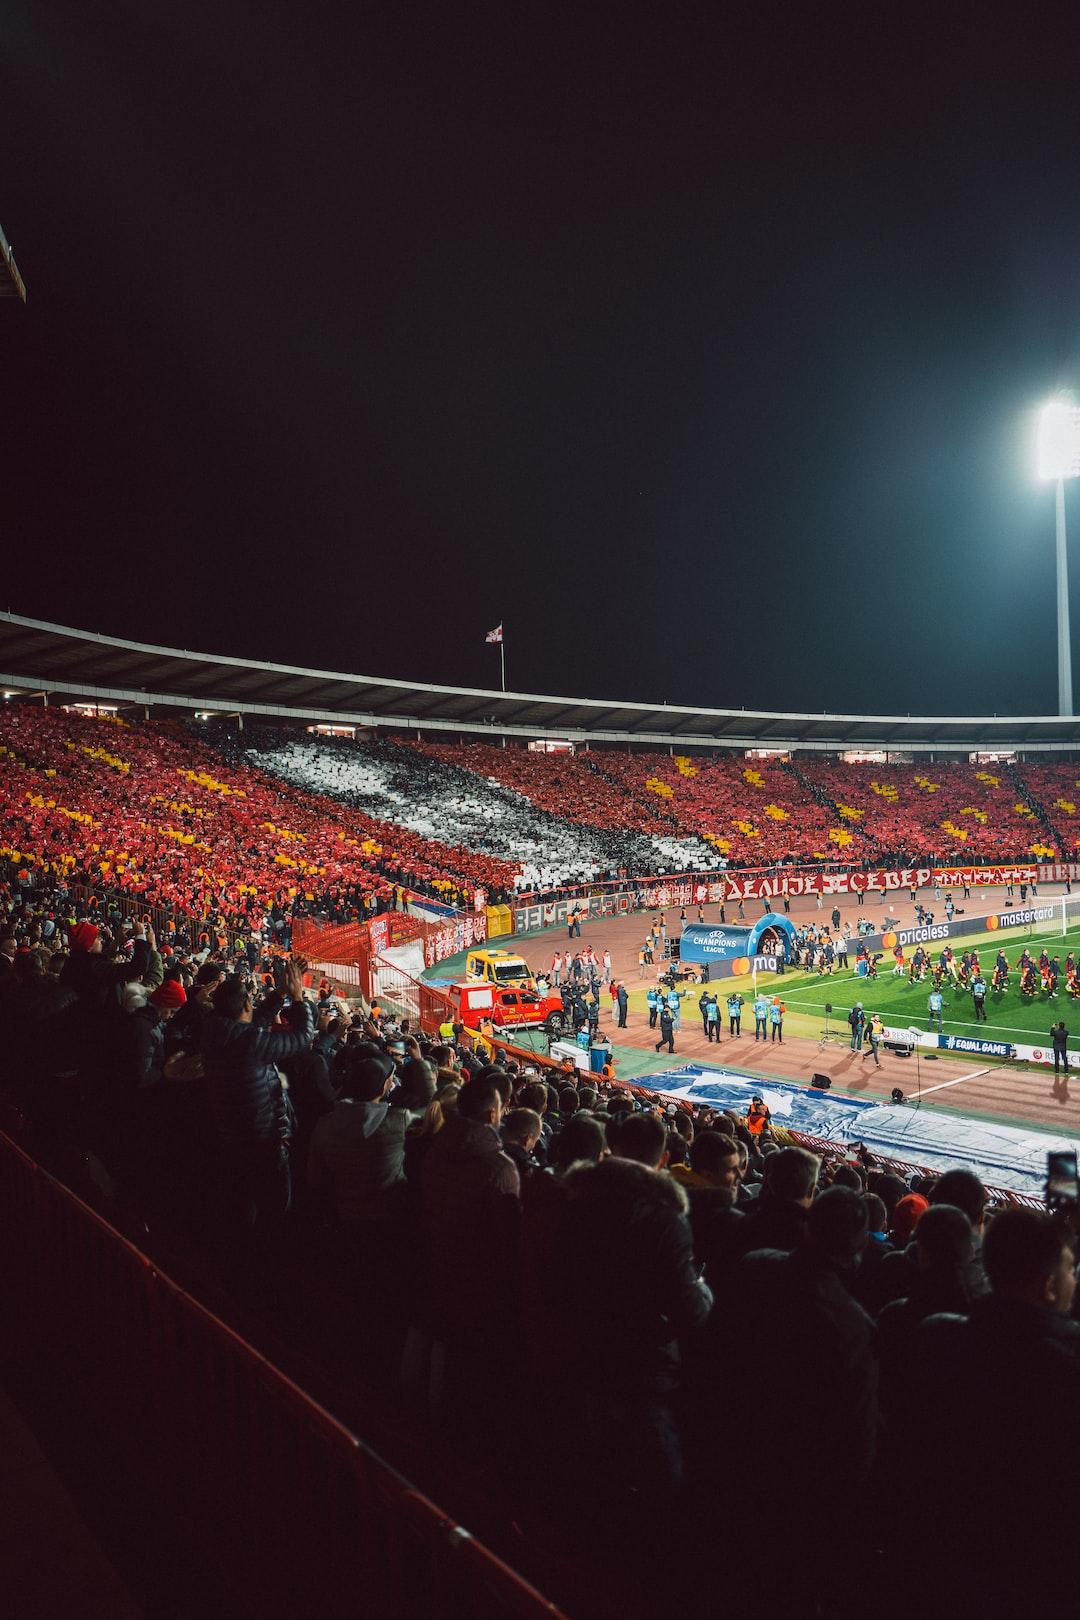 The Rajko Mitić Stadium in Belgrade ahead of the Champions League match between Red Star Belgrade and Bayern Munich